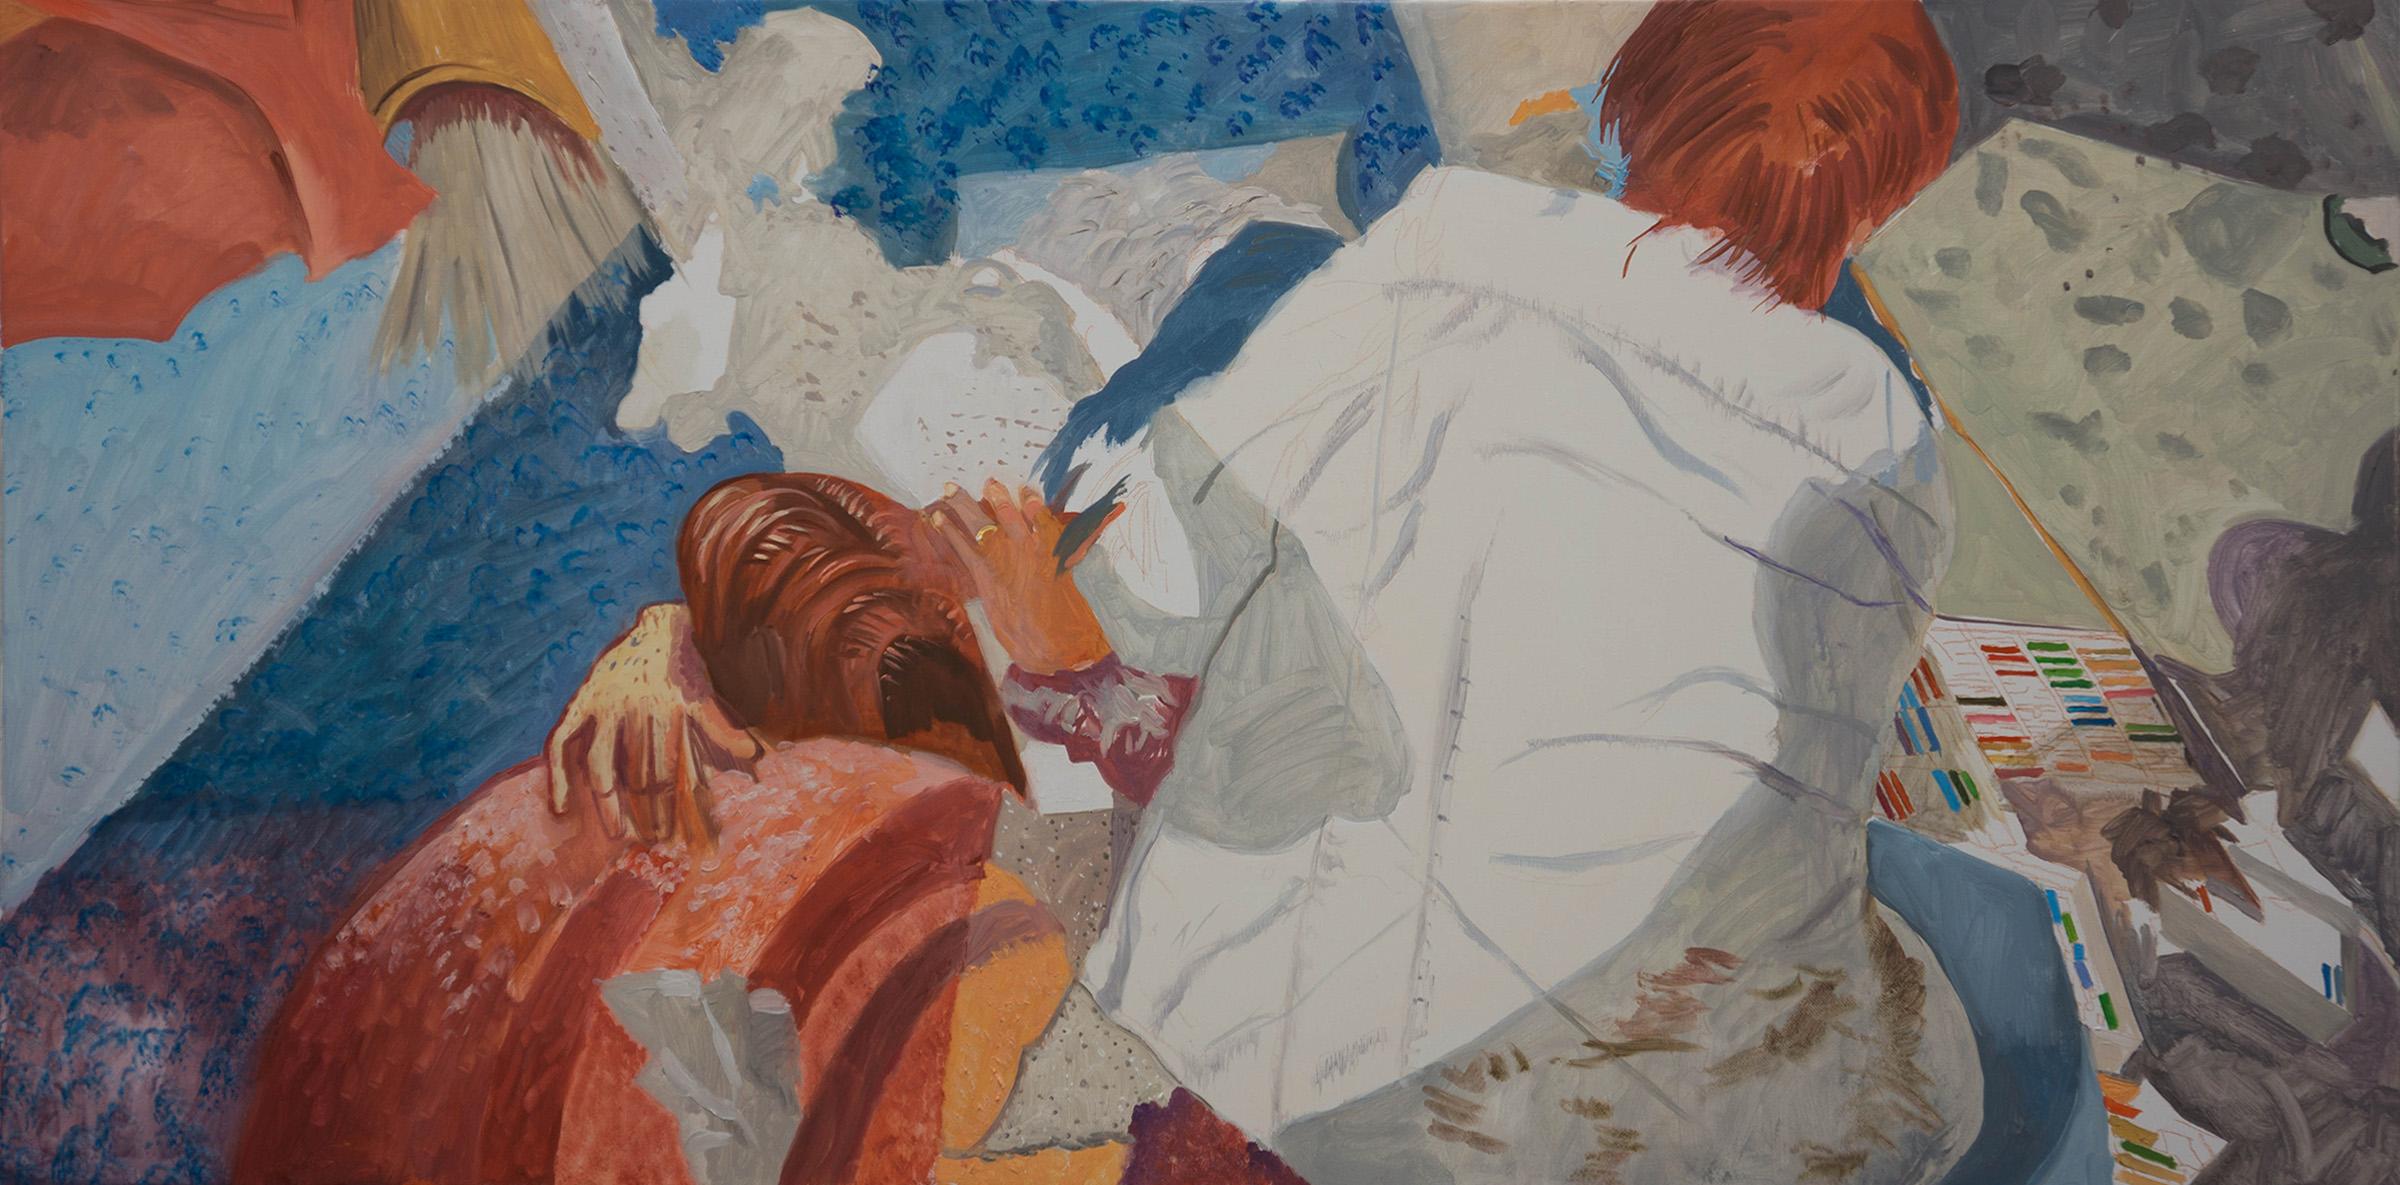 "ANO KATO 42  24x48"" oil on portrait linen  based on photos i shot in 2010 of a sidewalk artist in  denver, co."